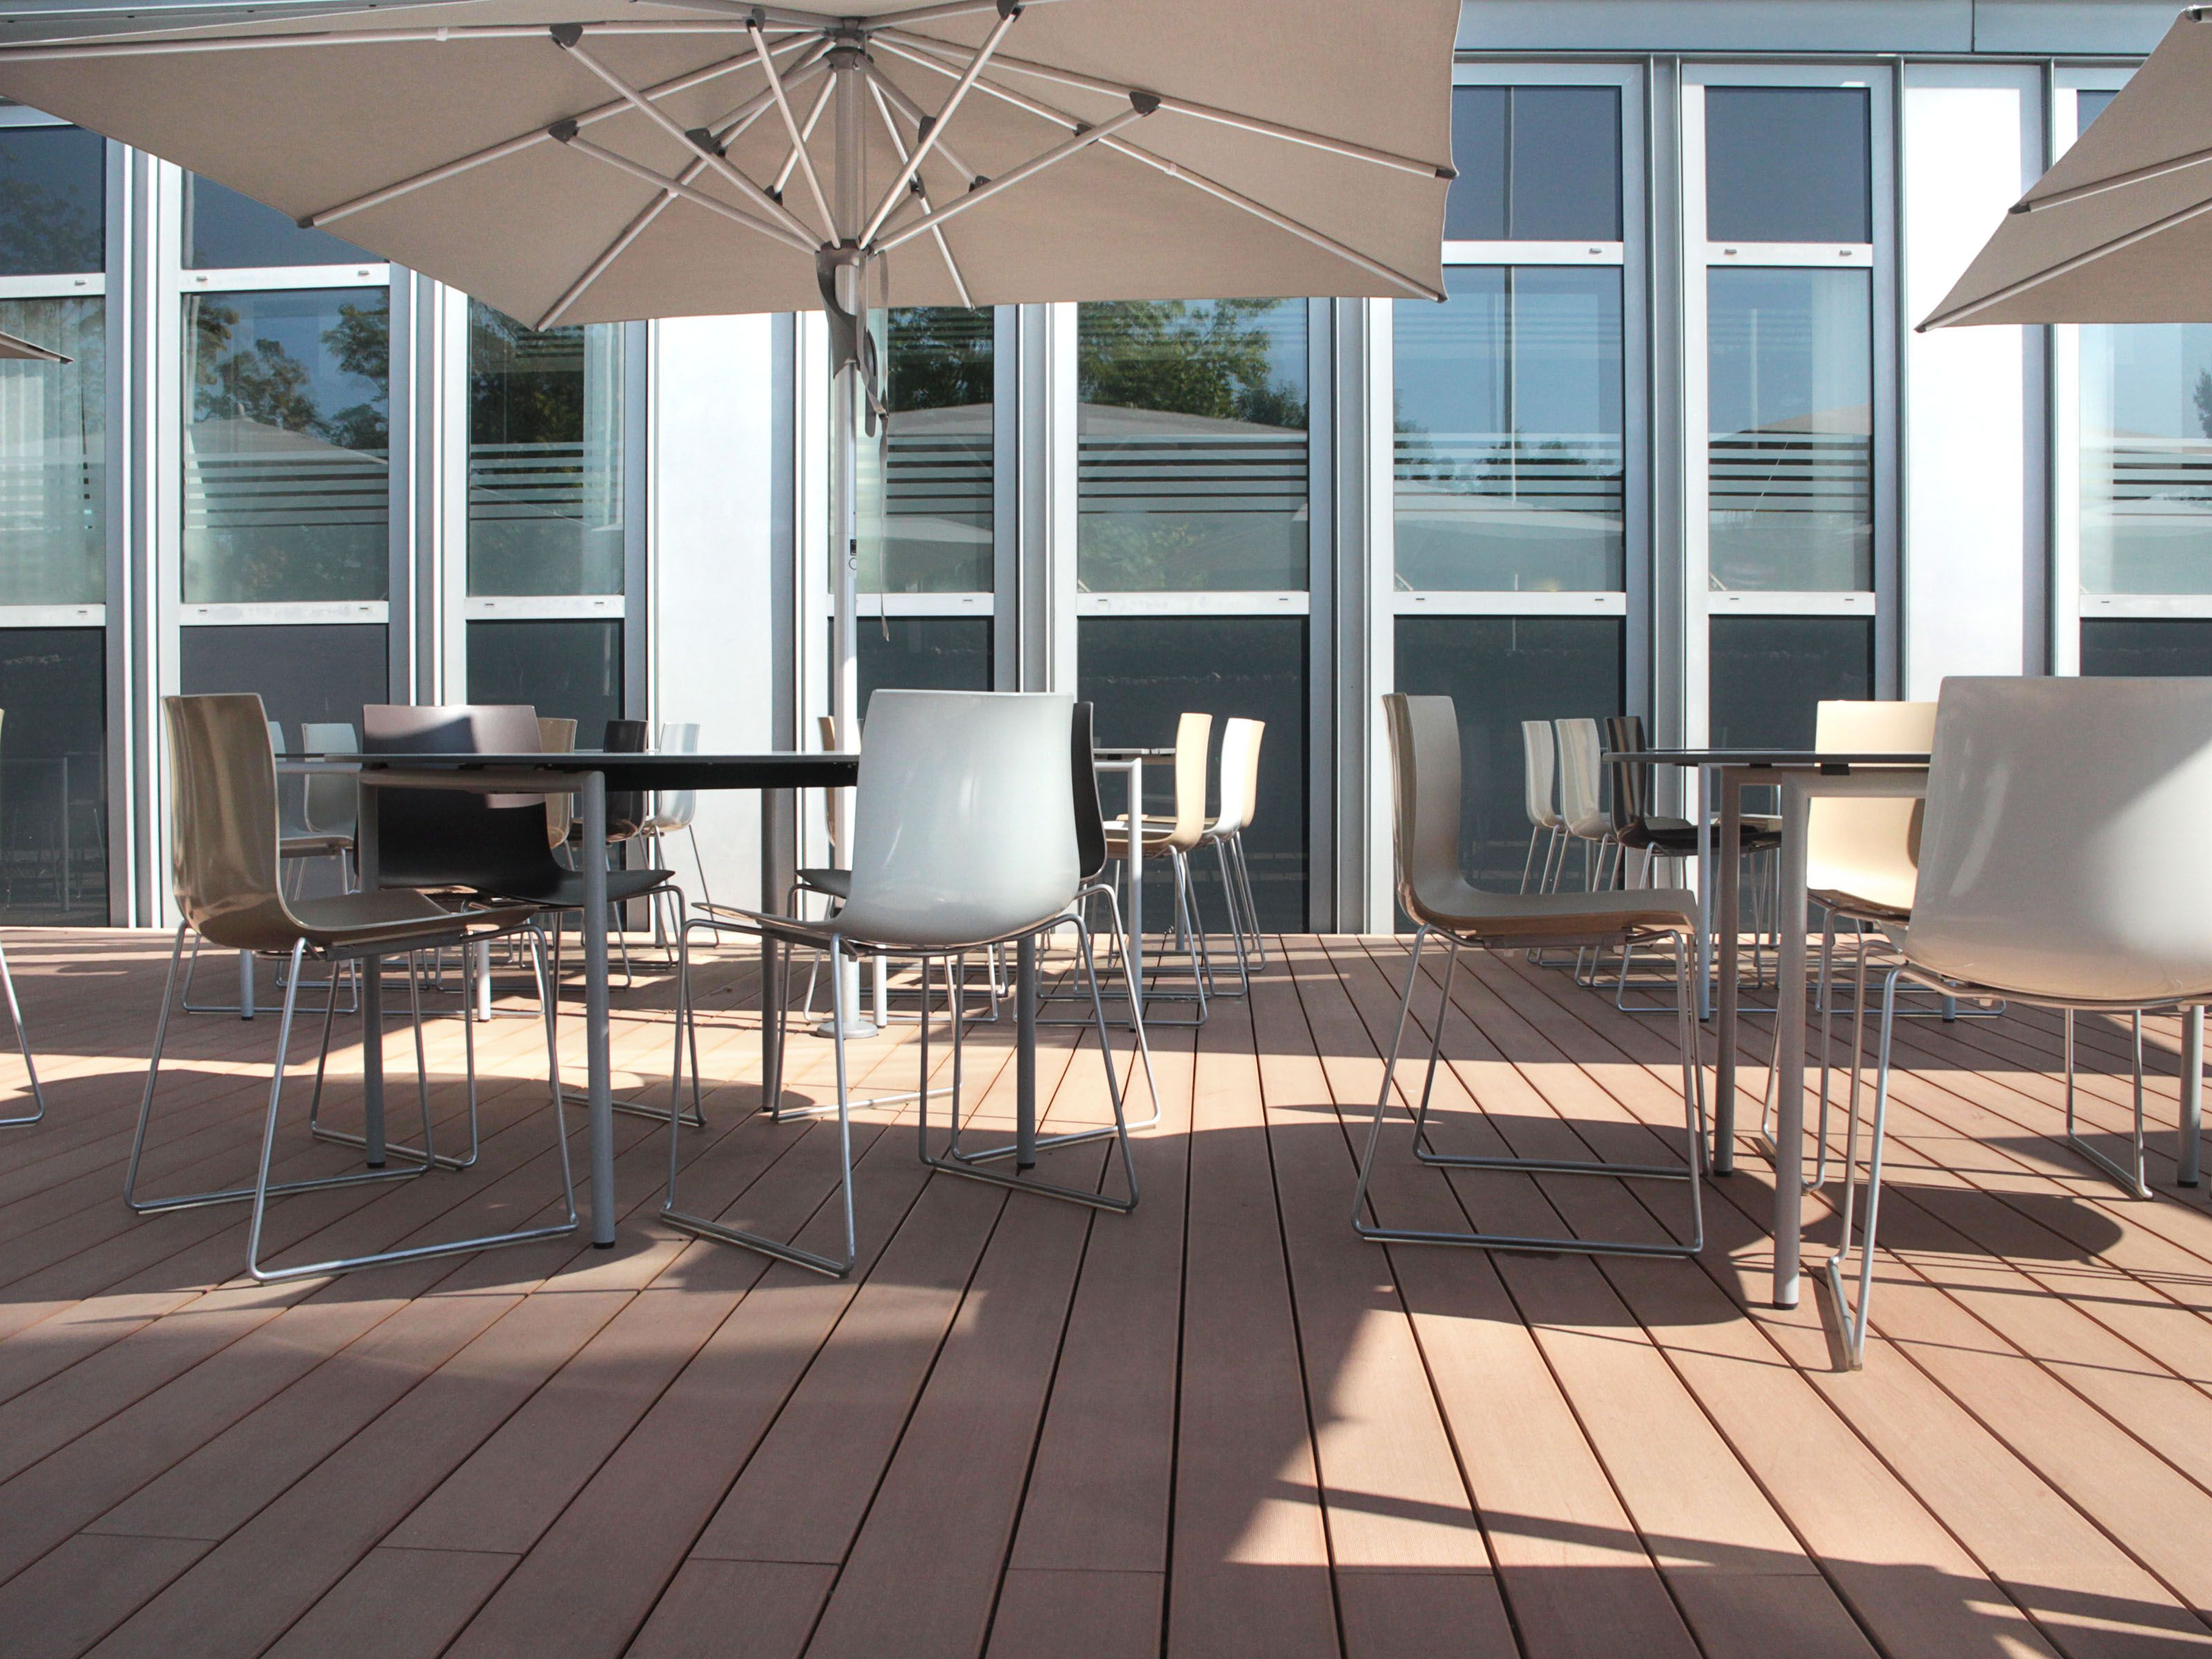 Wetterfeste Terrassendielen aus Holz + Kunststoff | Terrassenbelag ...